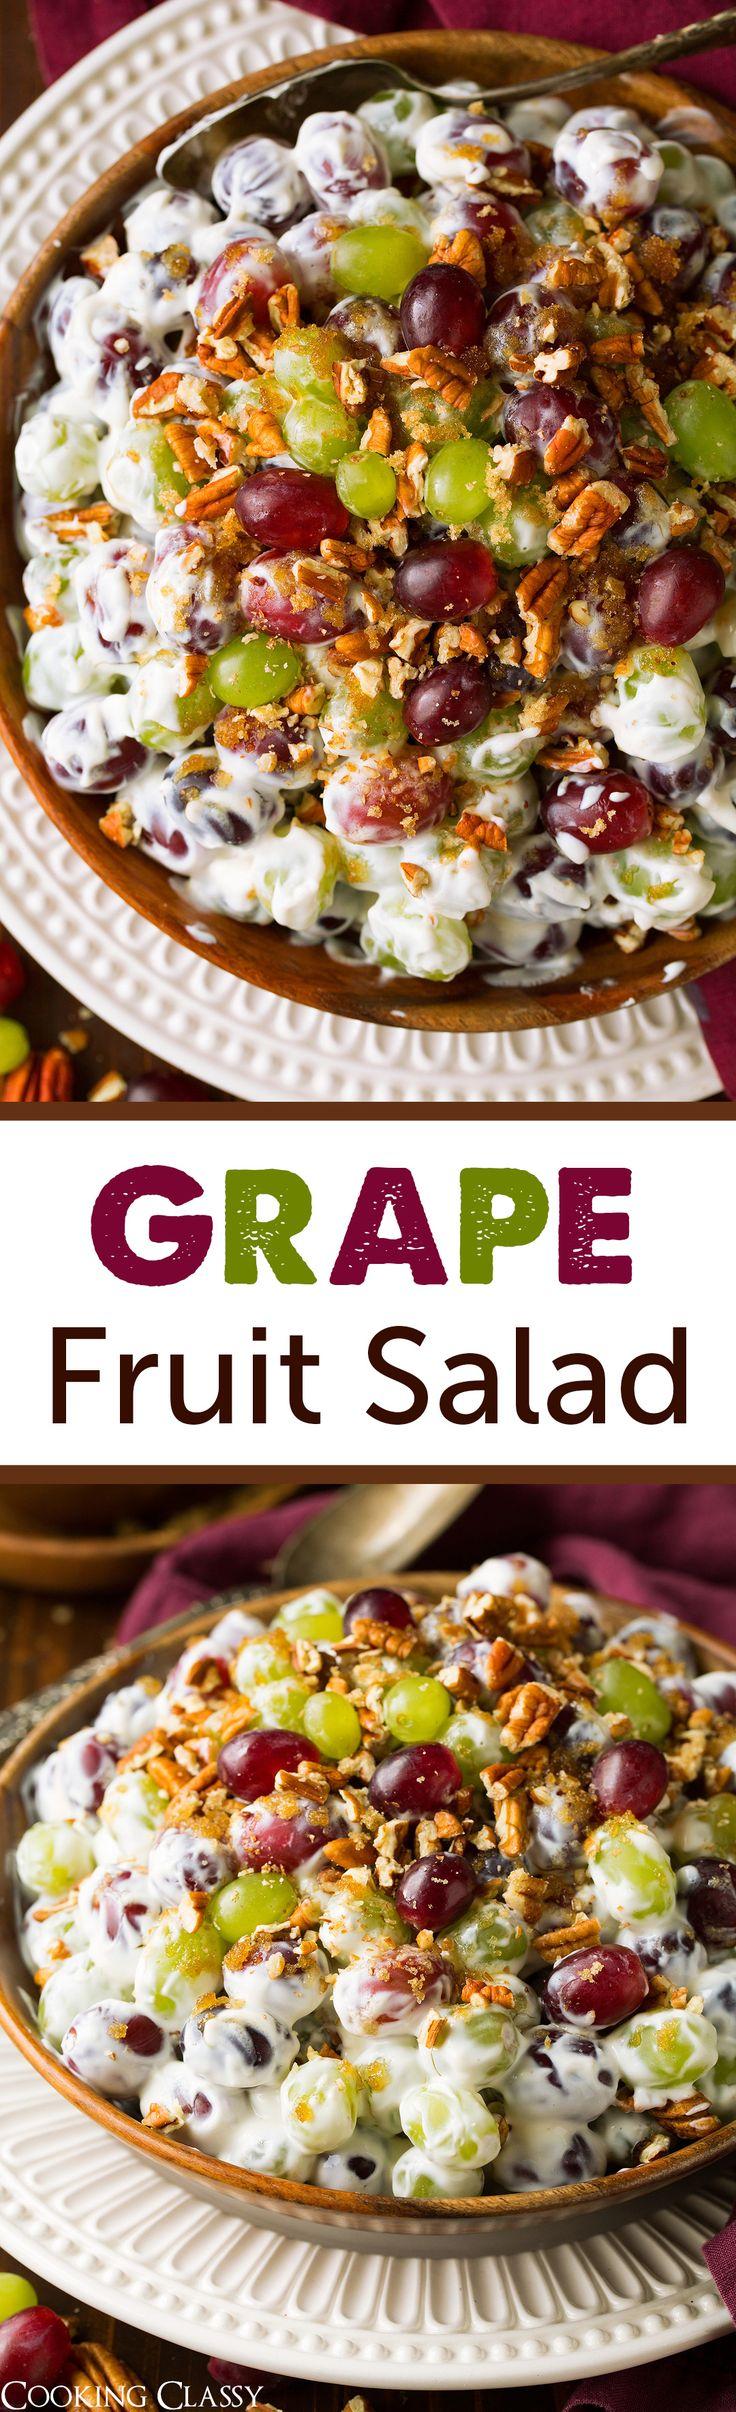 Creamy Grape Fruit Salad - Cooking Classy